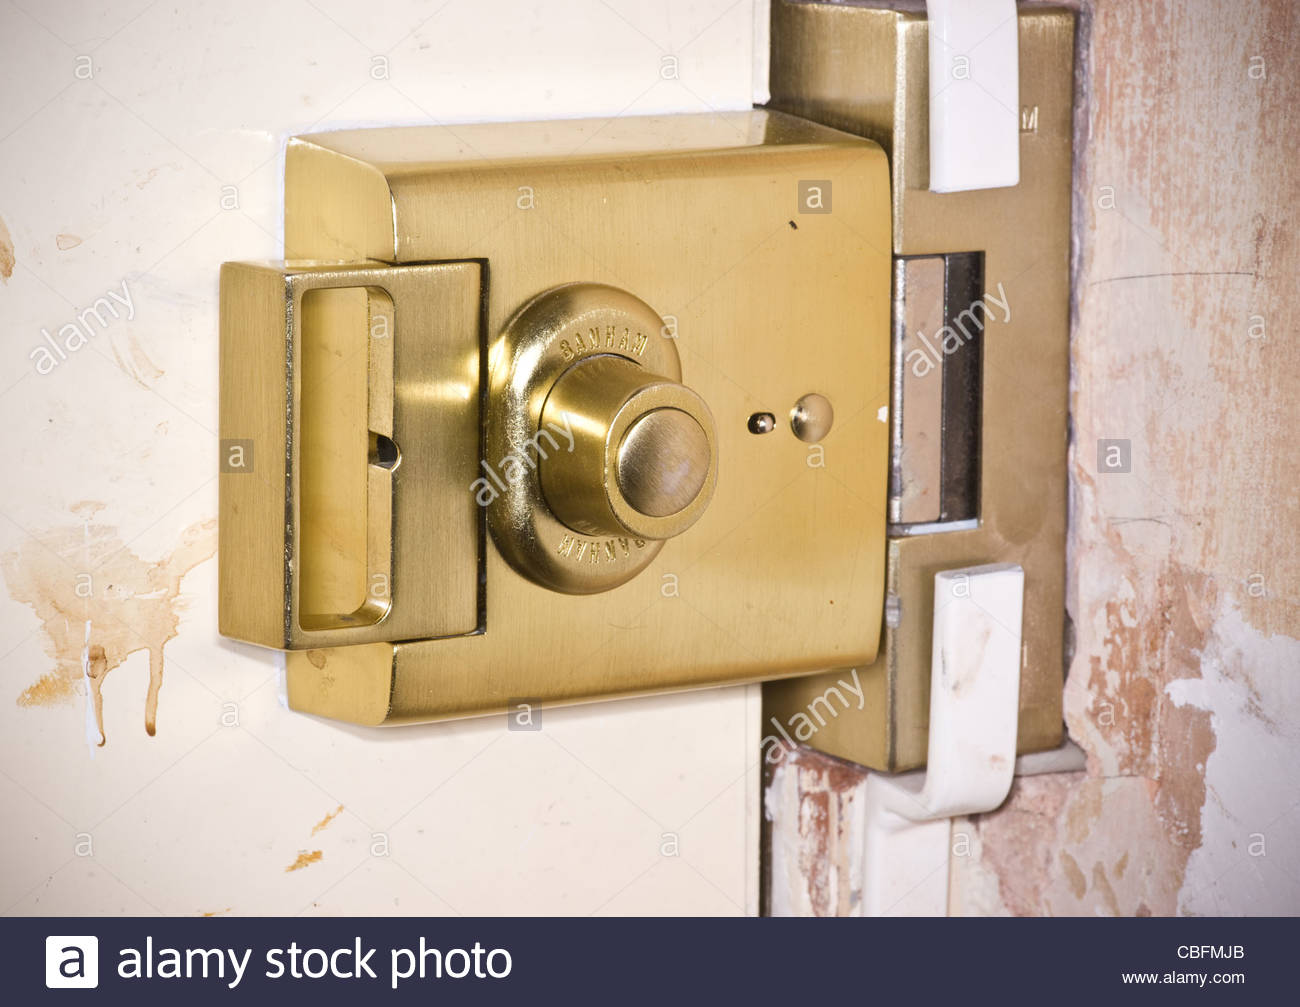 Banham Door Lock Stock Photo Alamy